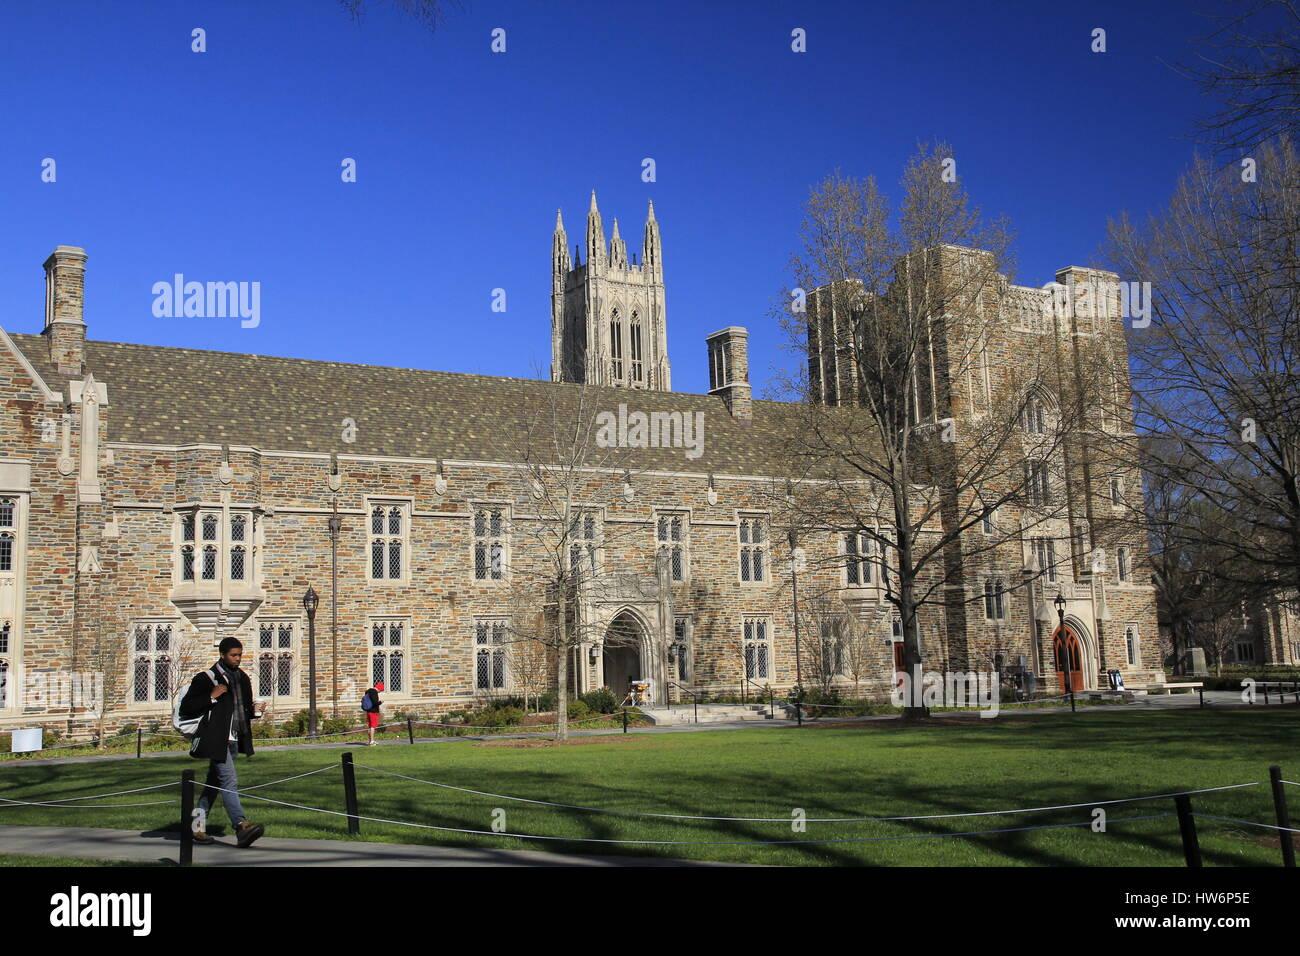 Students walking across campus lawn Duke University Durham North Carolina Stock Photo